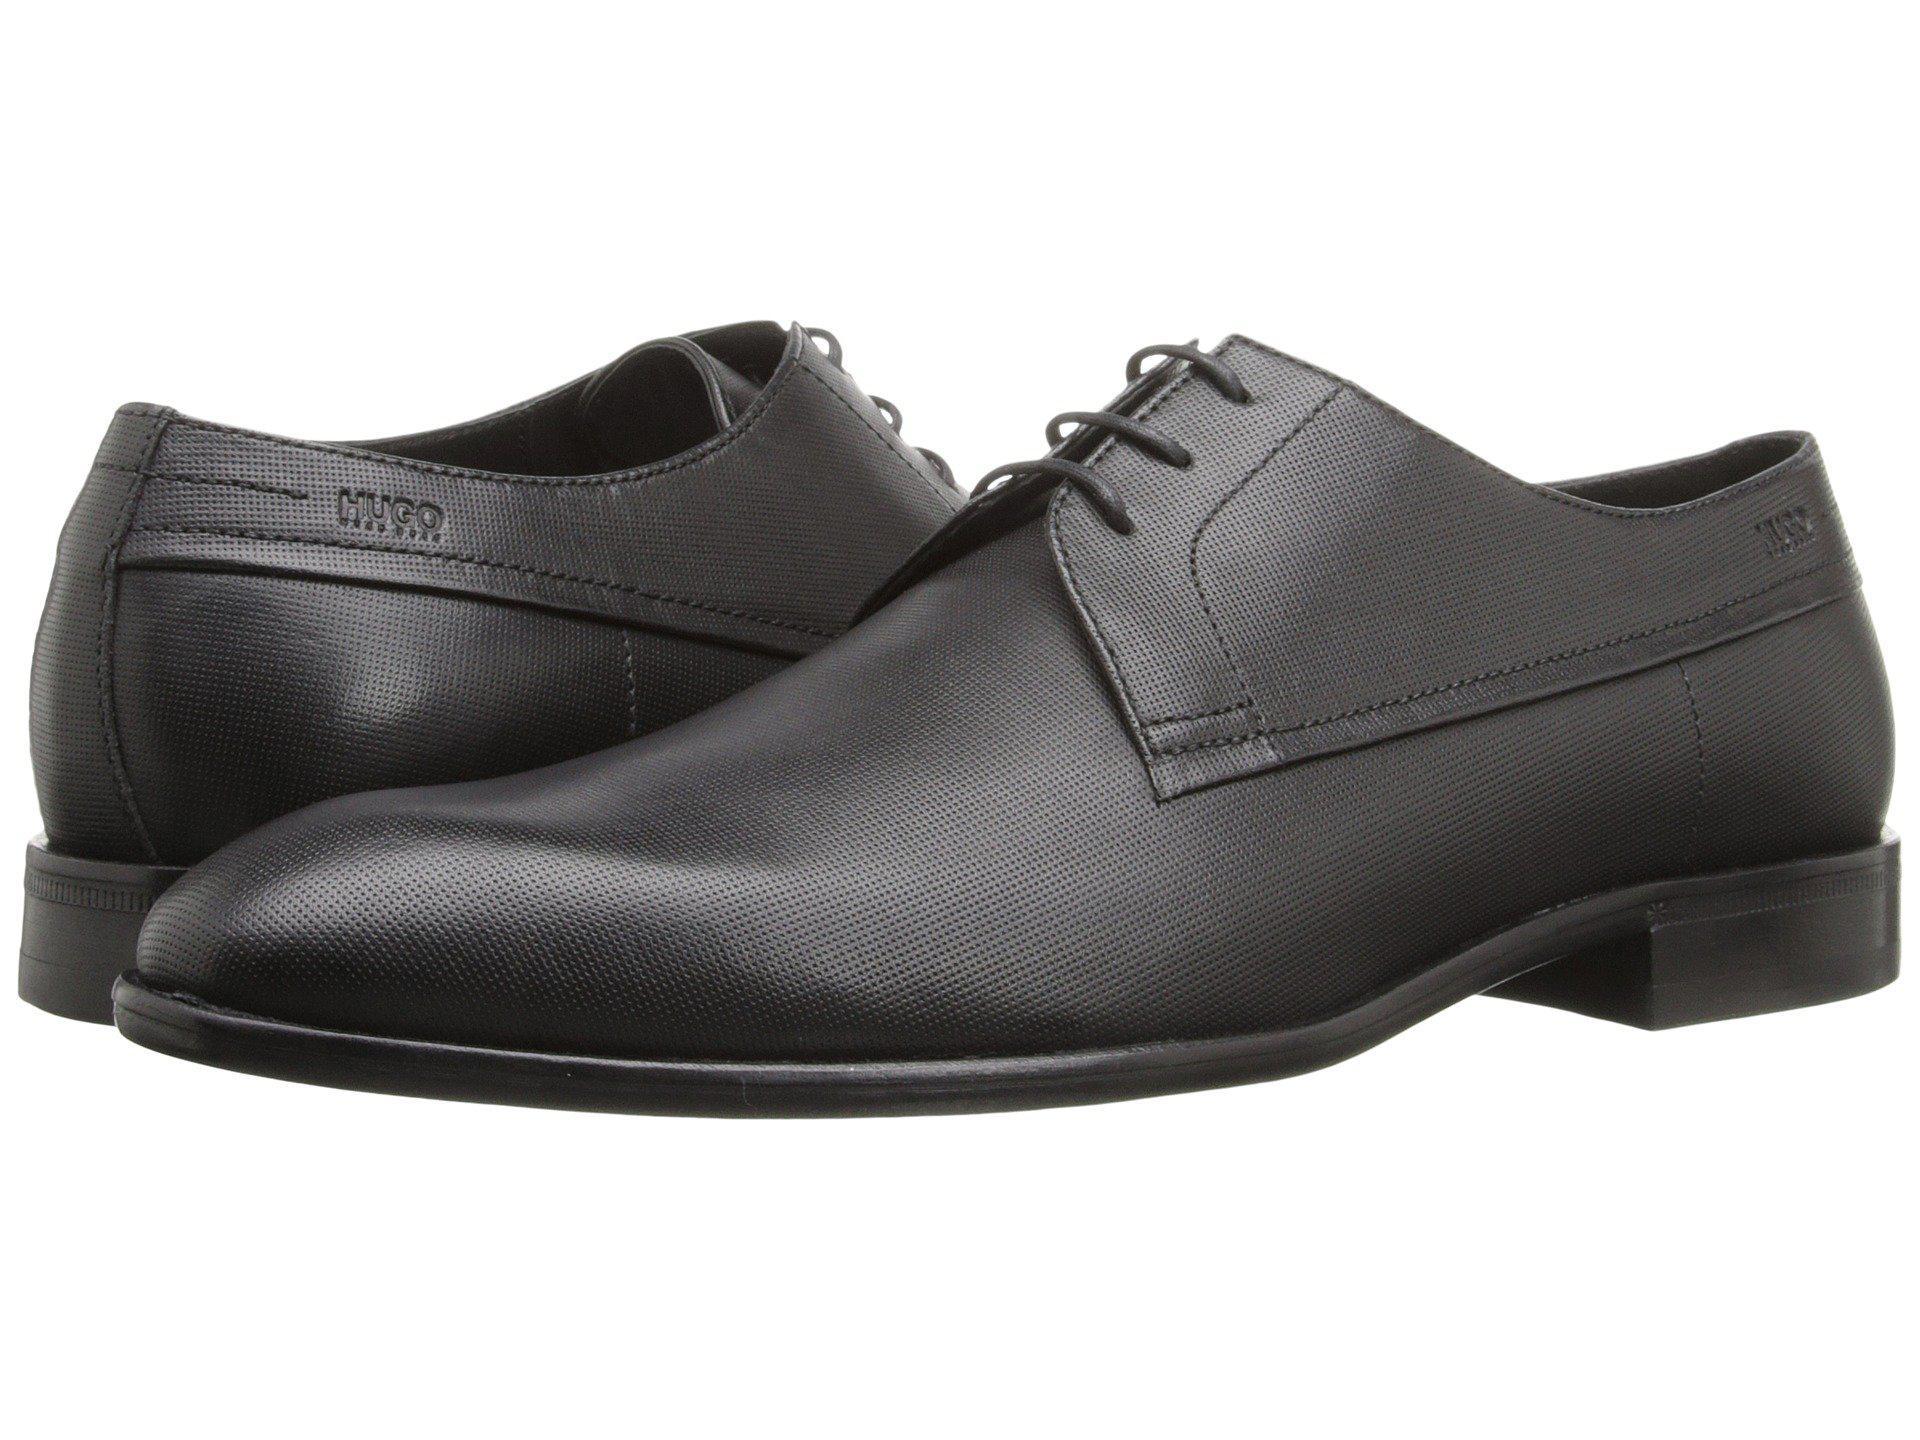 7ebcffb40c1 Lyst - BOSS Dress Appeal C-drerom Lace-up Derby in Black for Men